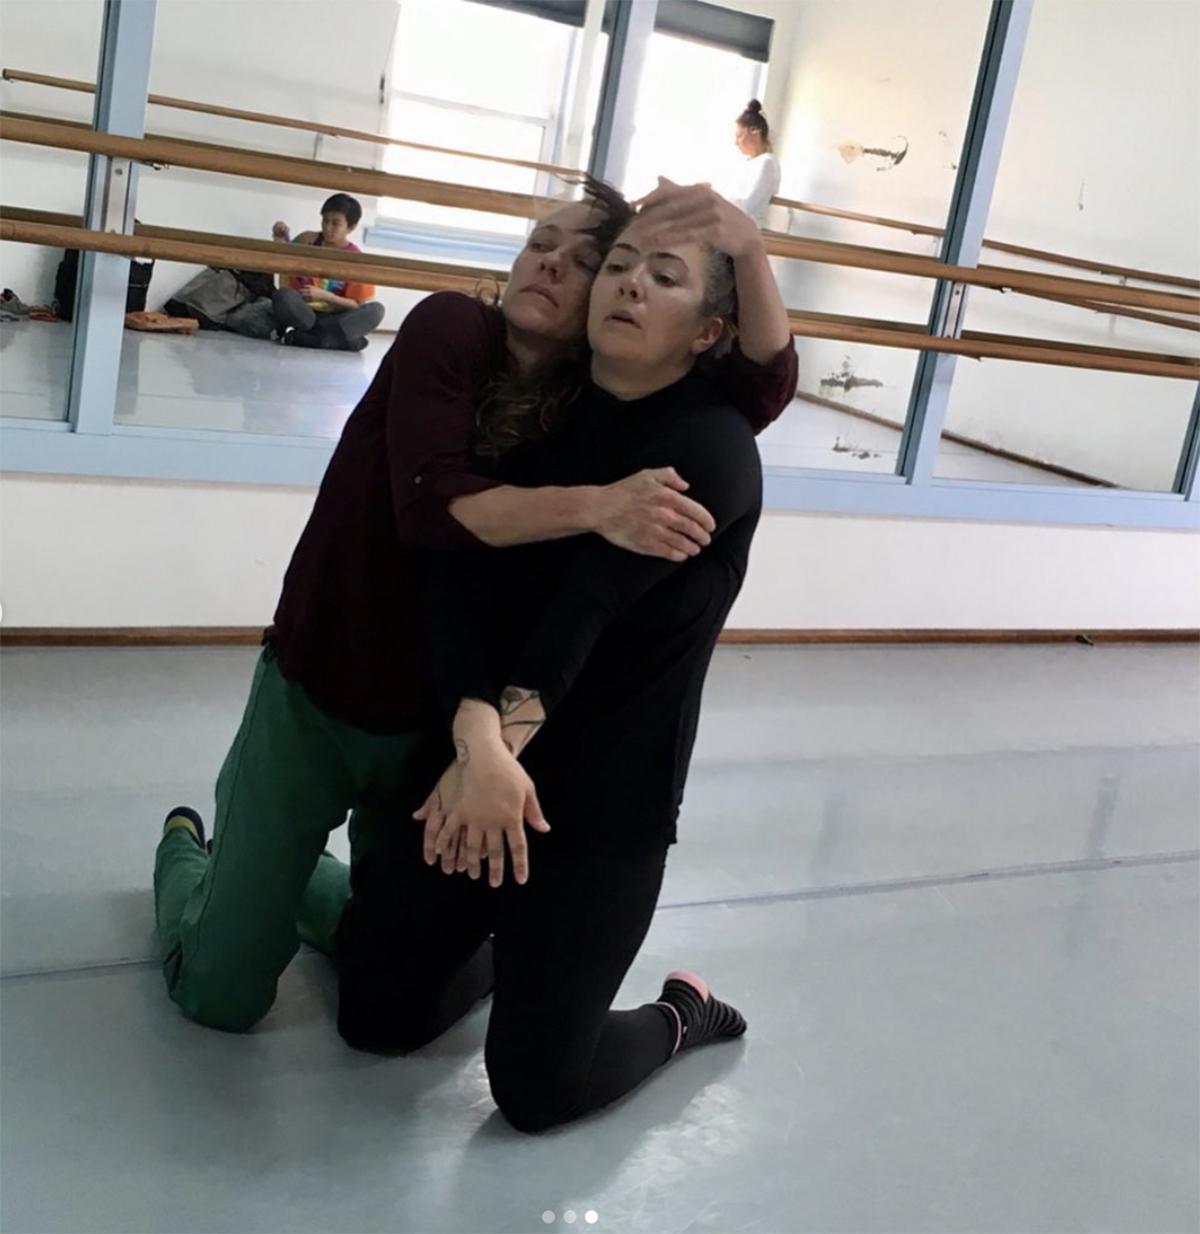 A dancer embraces another dancer.